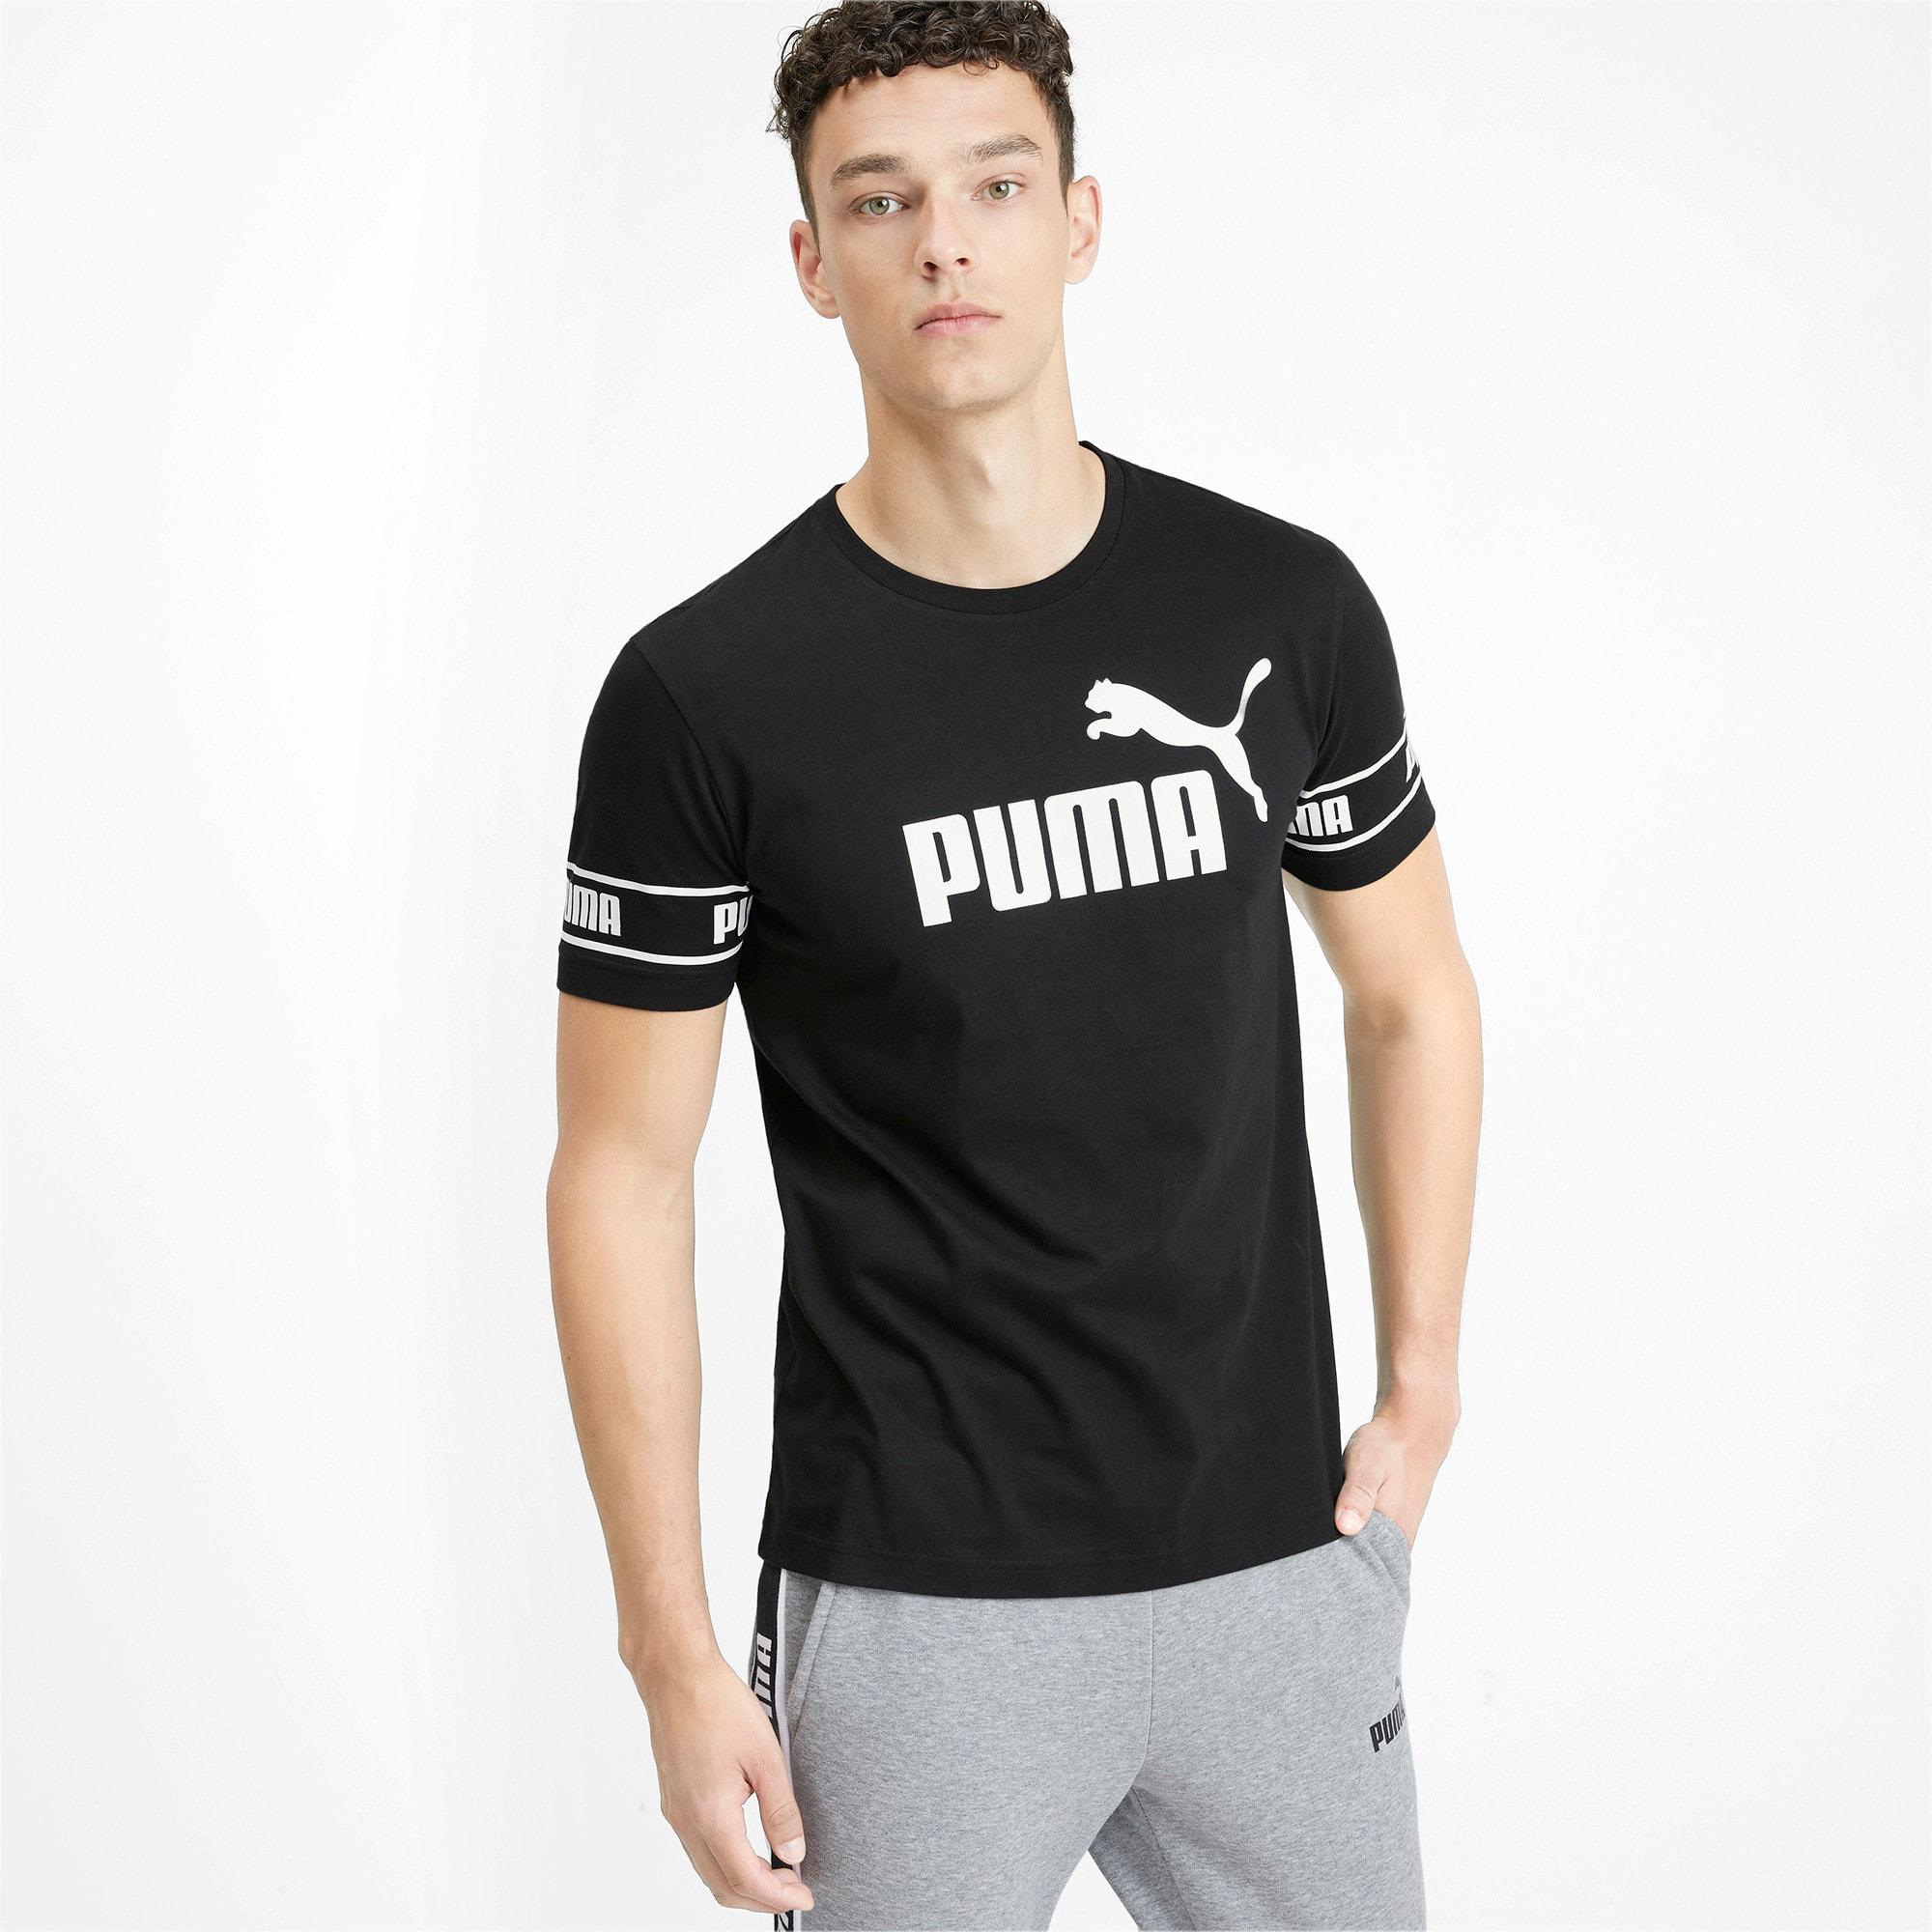 Thumbnail 1 of Amplified Men's Big Logo Tee, Puma Black, medium